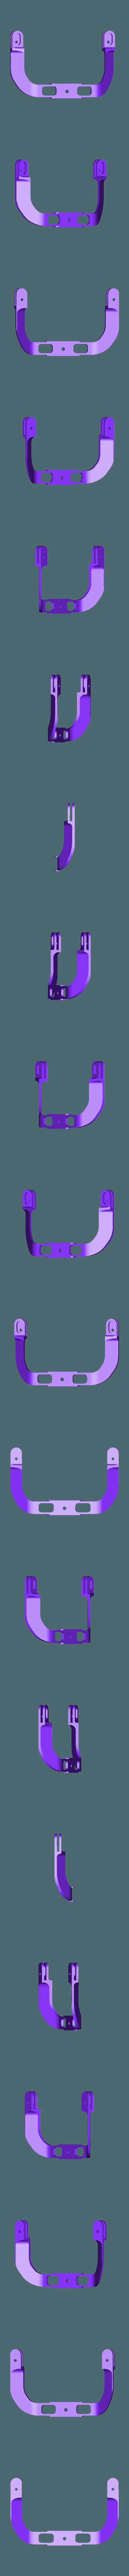 Ender_3_Pro_Bed_Handle_V3_-_Tripod_Mount_-_Box22.2mm.stl Download free STL file ADKS - Ender 3 Bed Handle with action cam mount • Template to 3D print, Adarkstudio